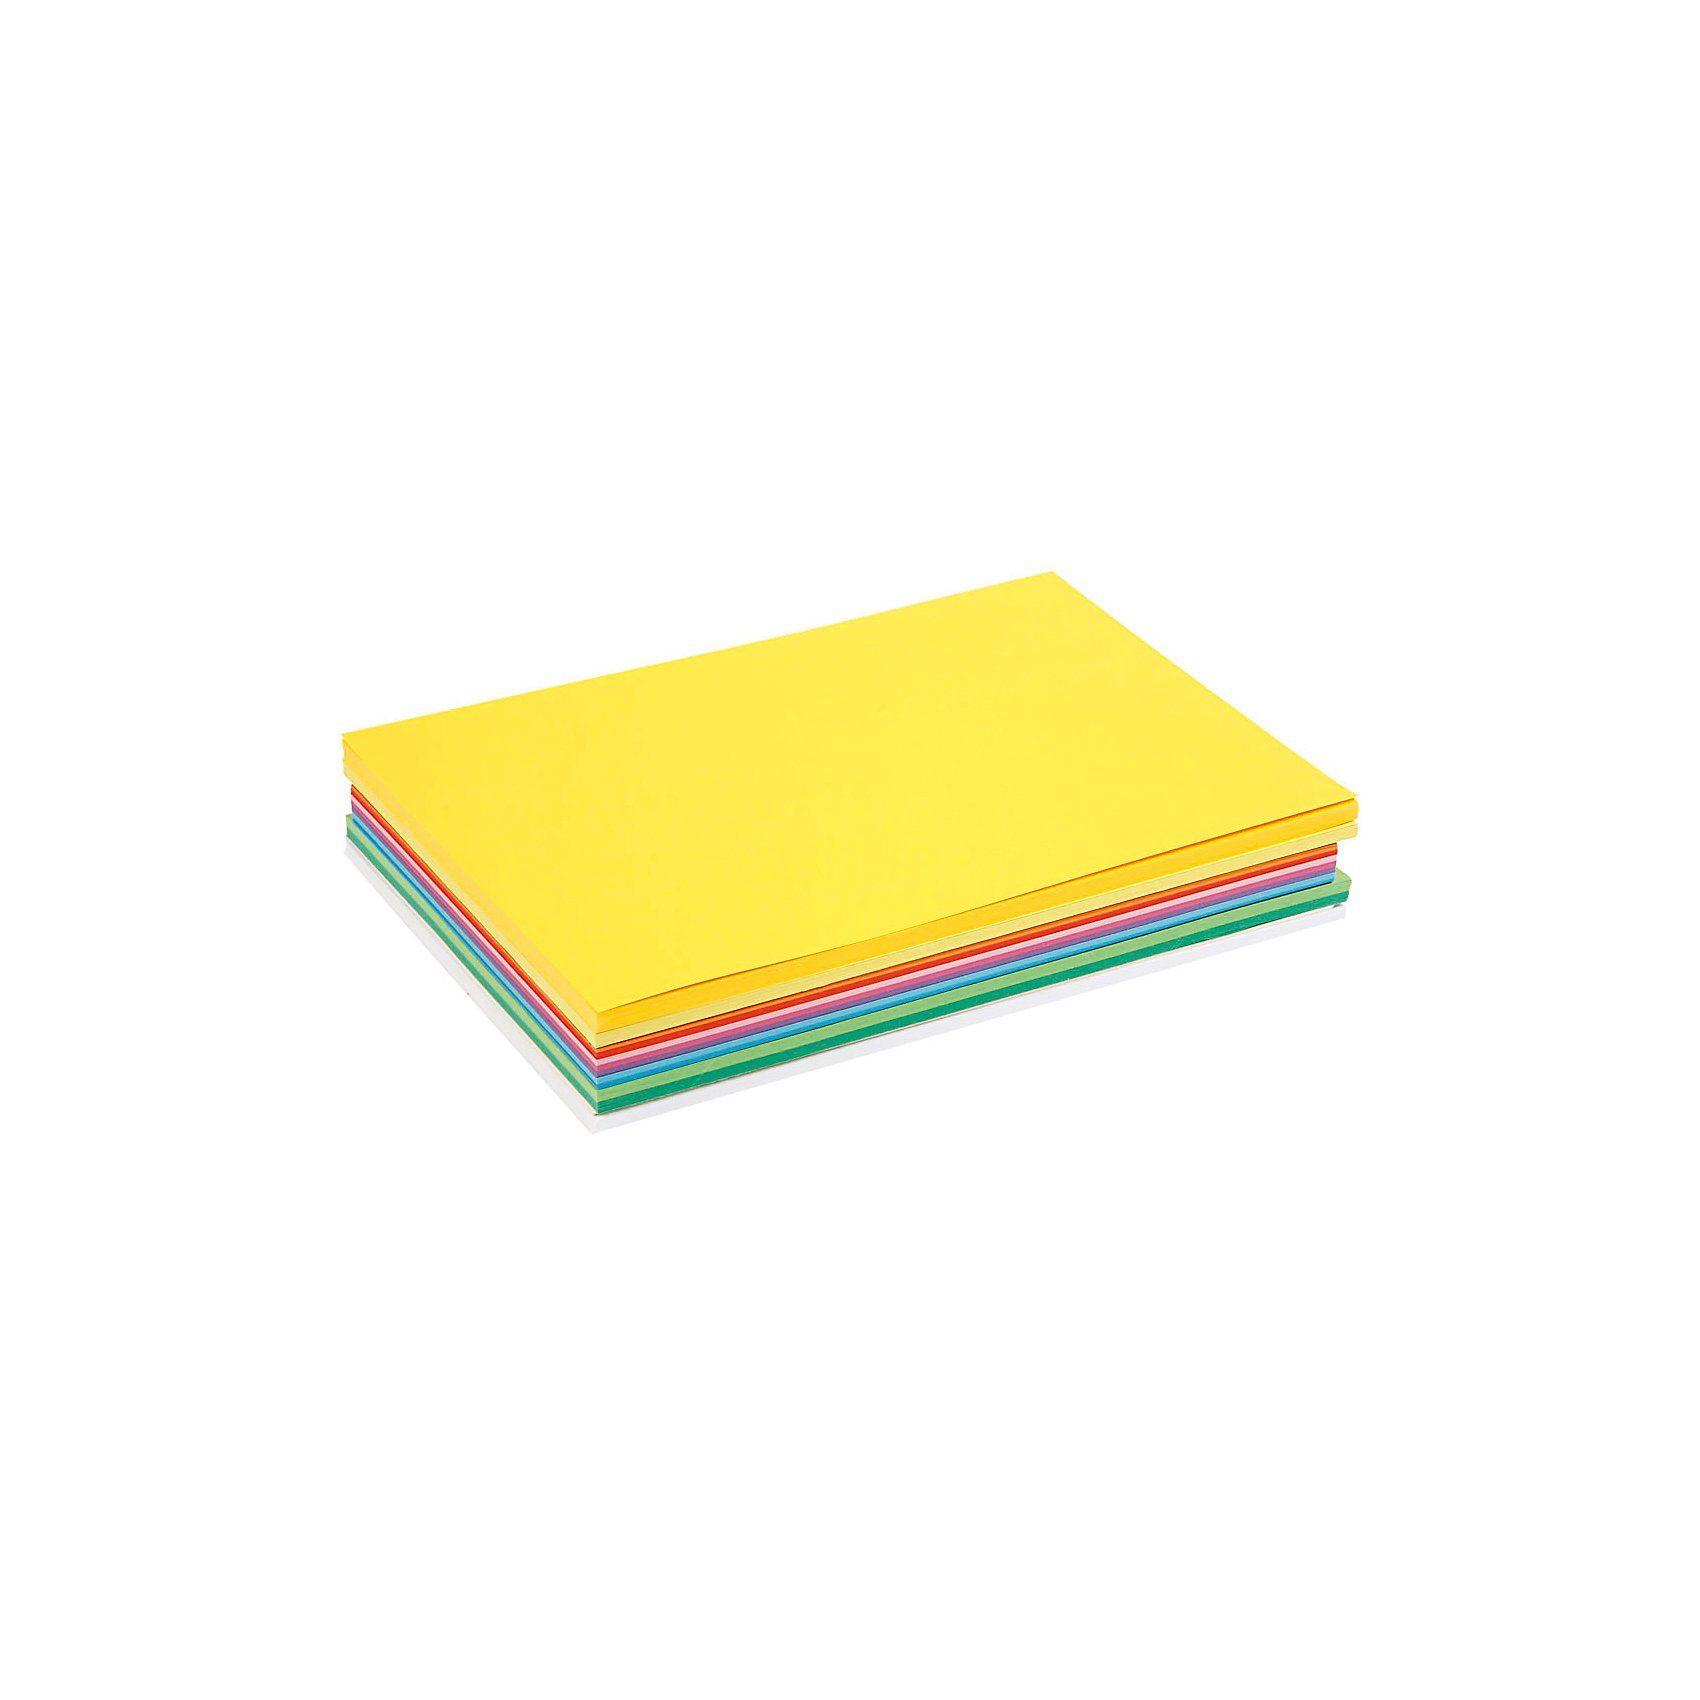 Karton in sortierten Farben, A4 210x297 mm, 180 g, Sortiert